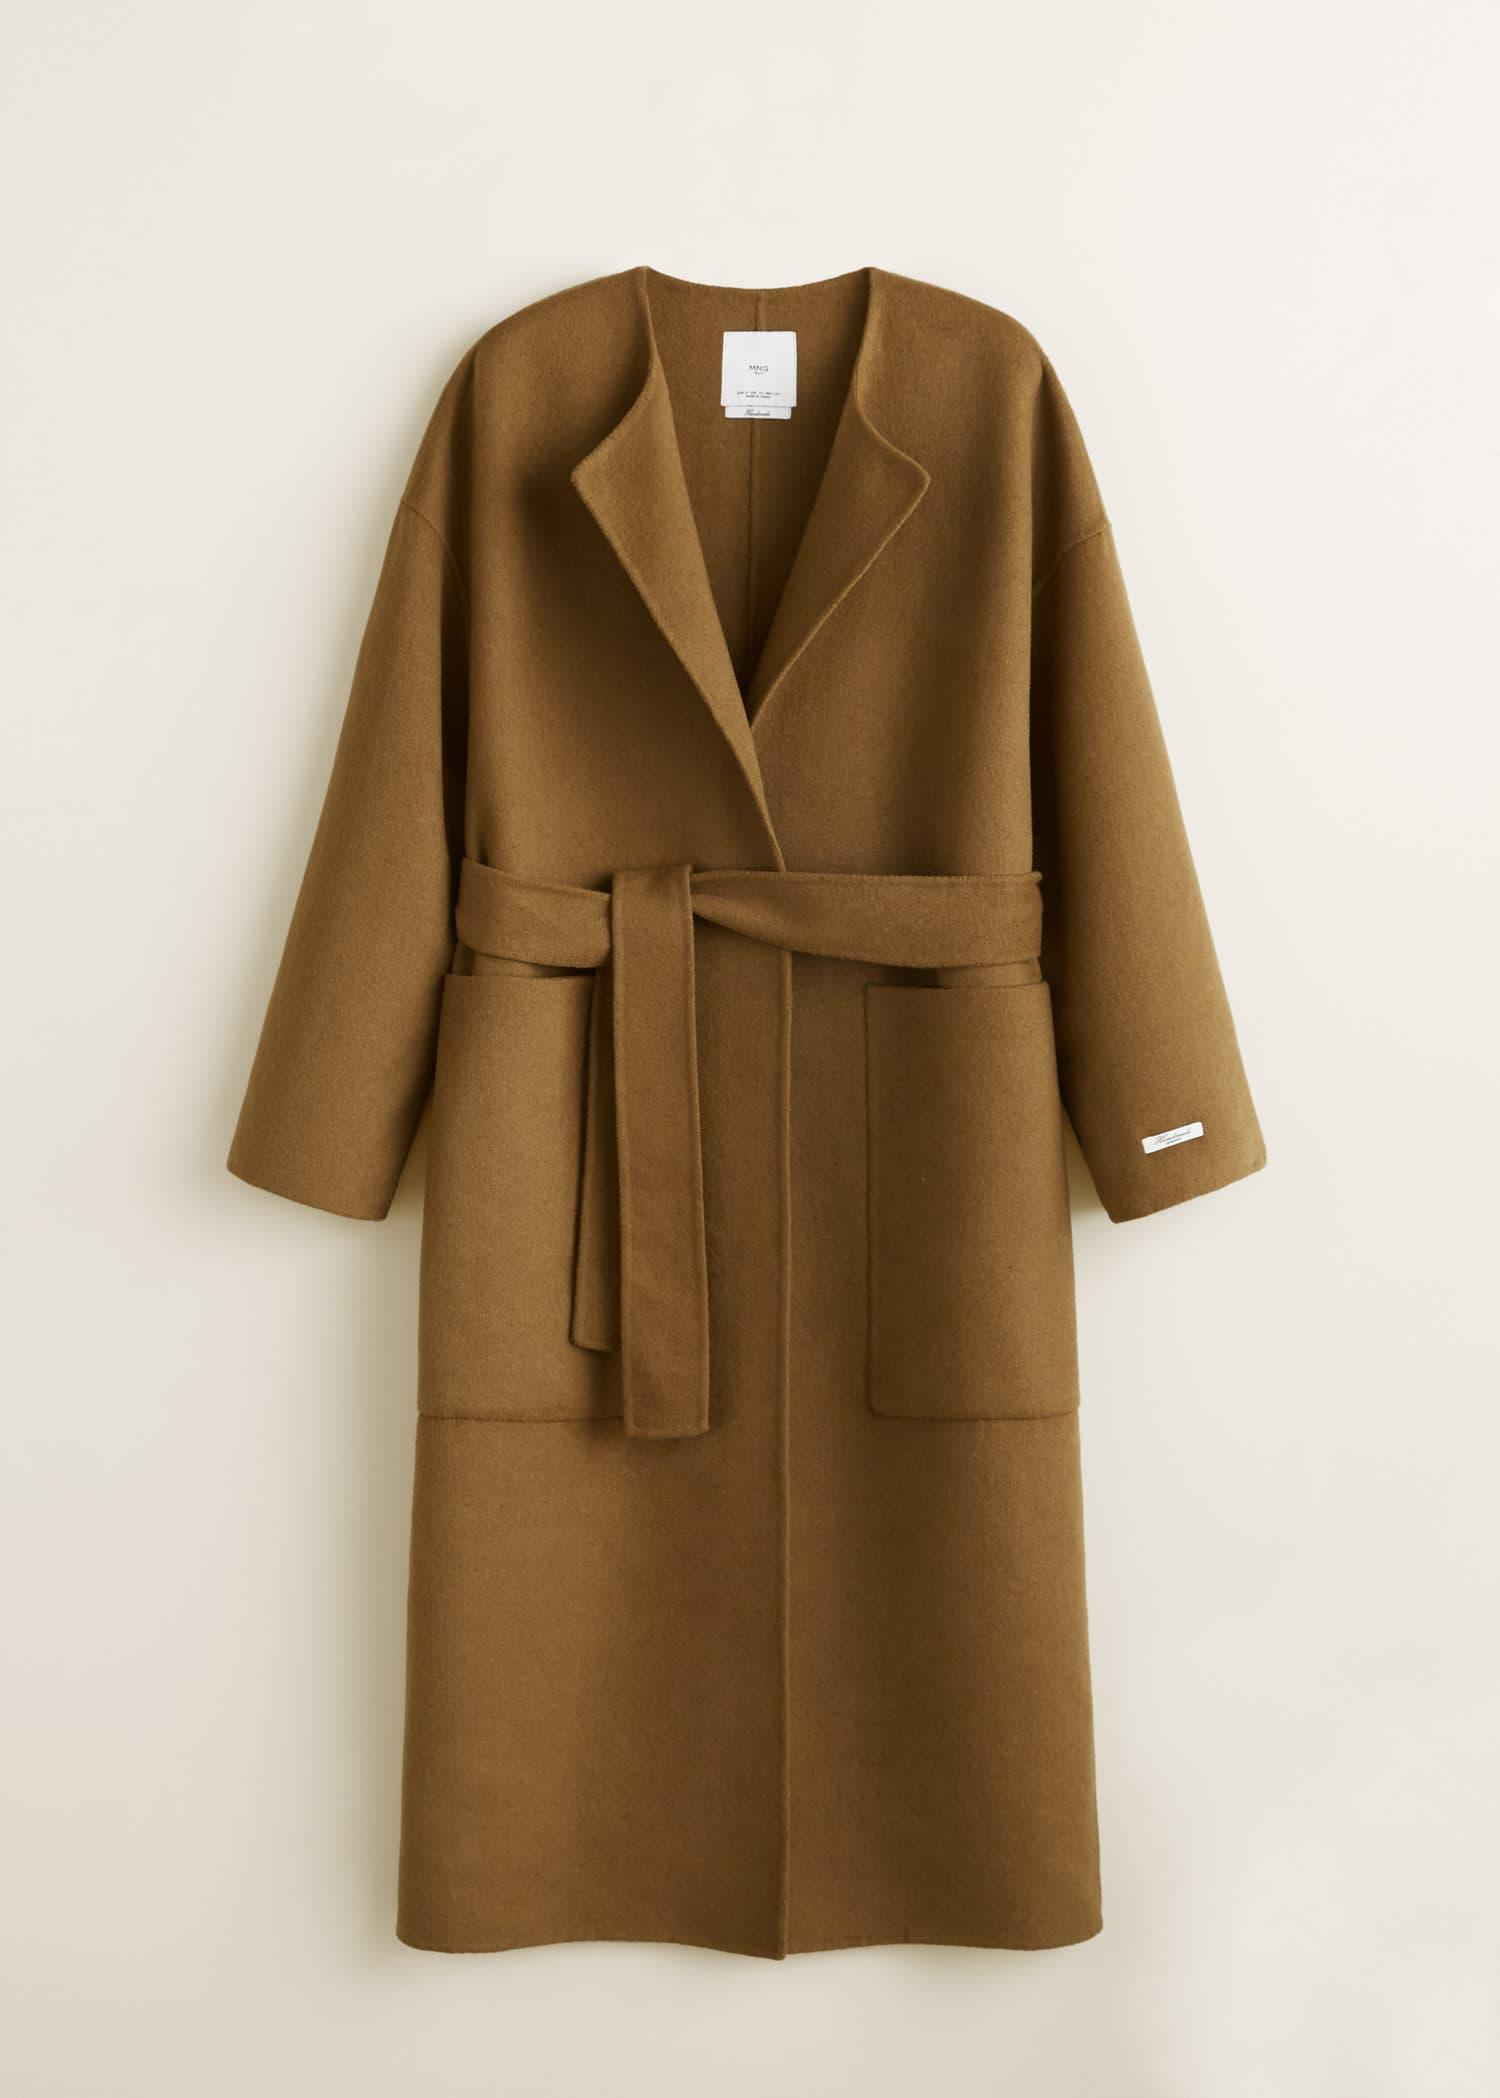 Belt handmade WomenMango coat USA coat WomenMango Belt handmade rCdexBo